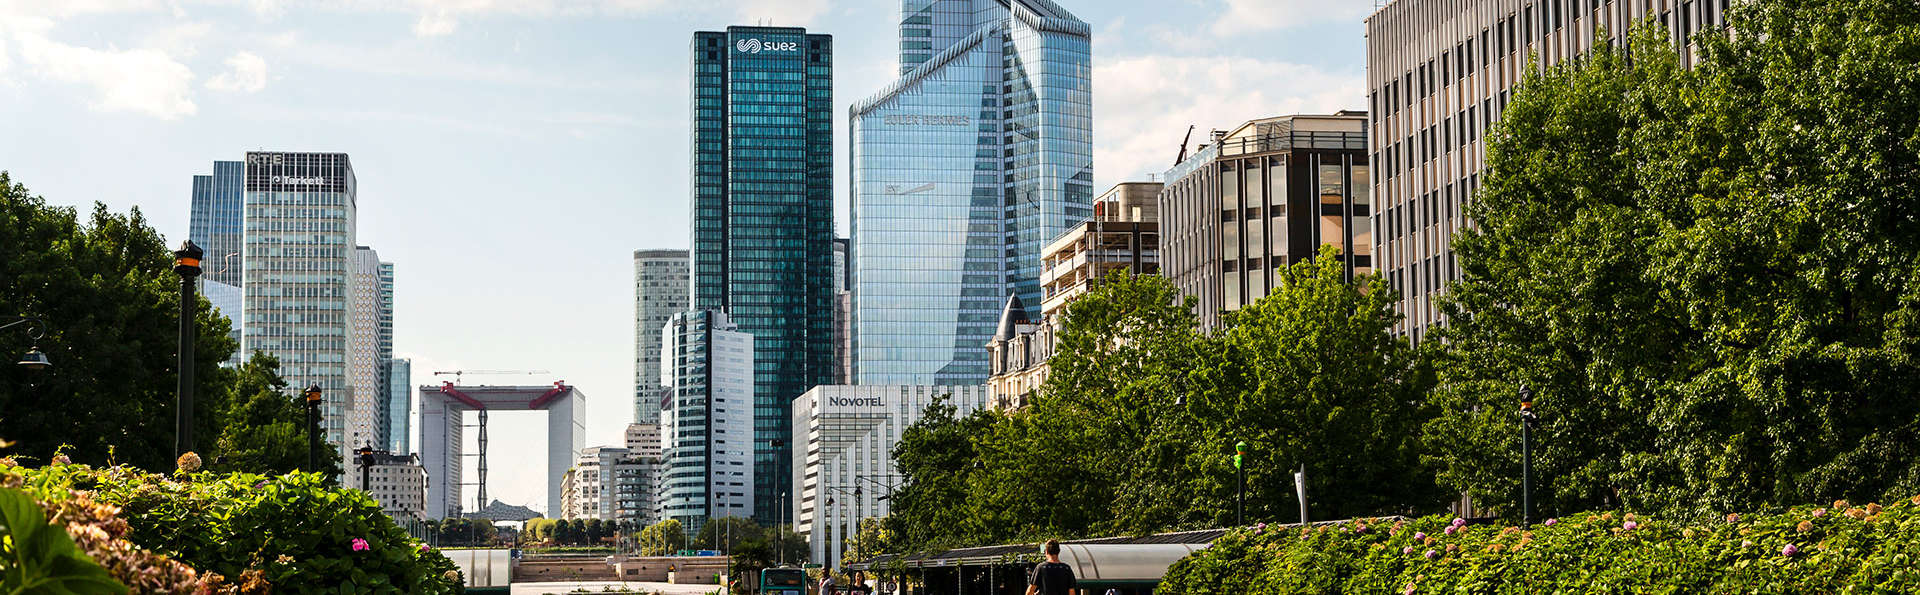 Hôtel Paris Neuilly - Edit_Destination.jpg